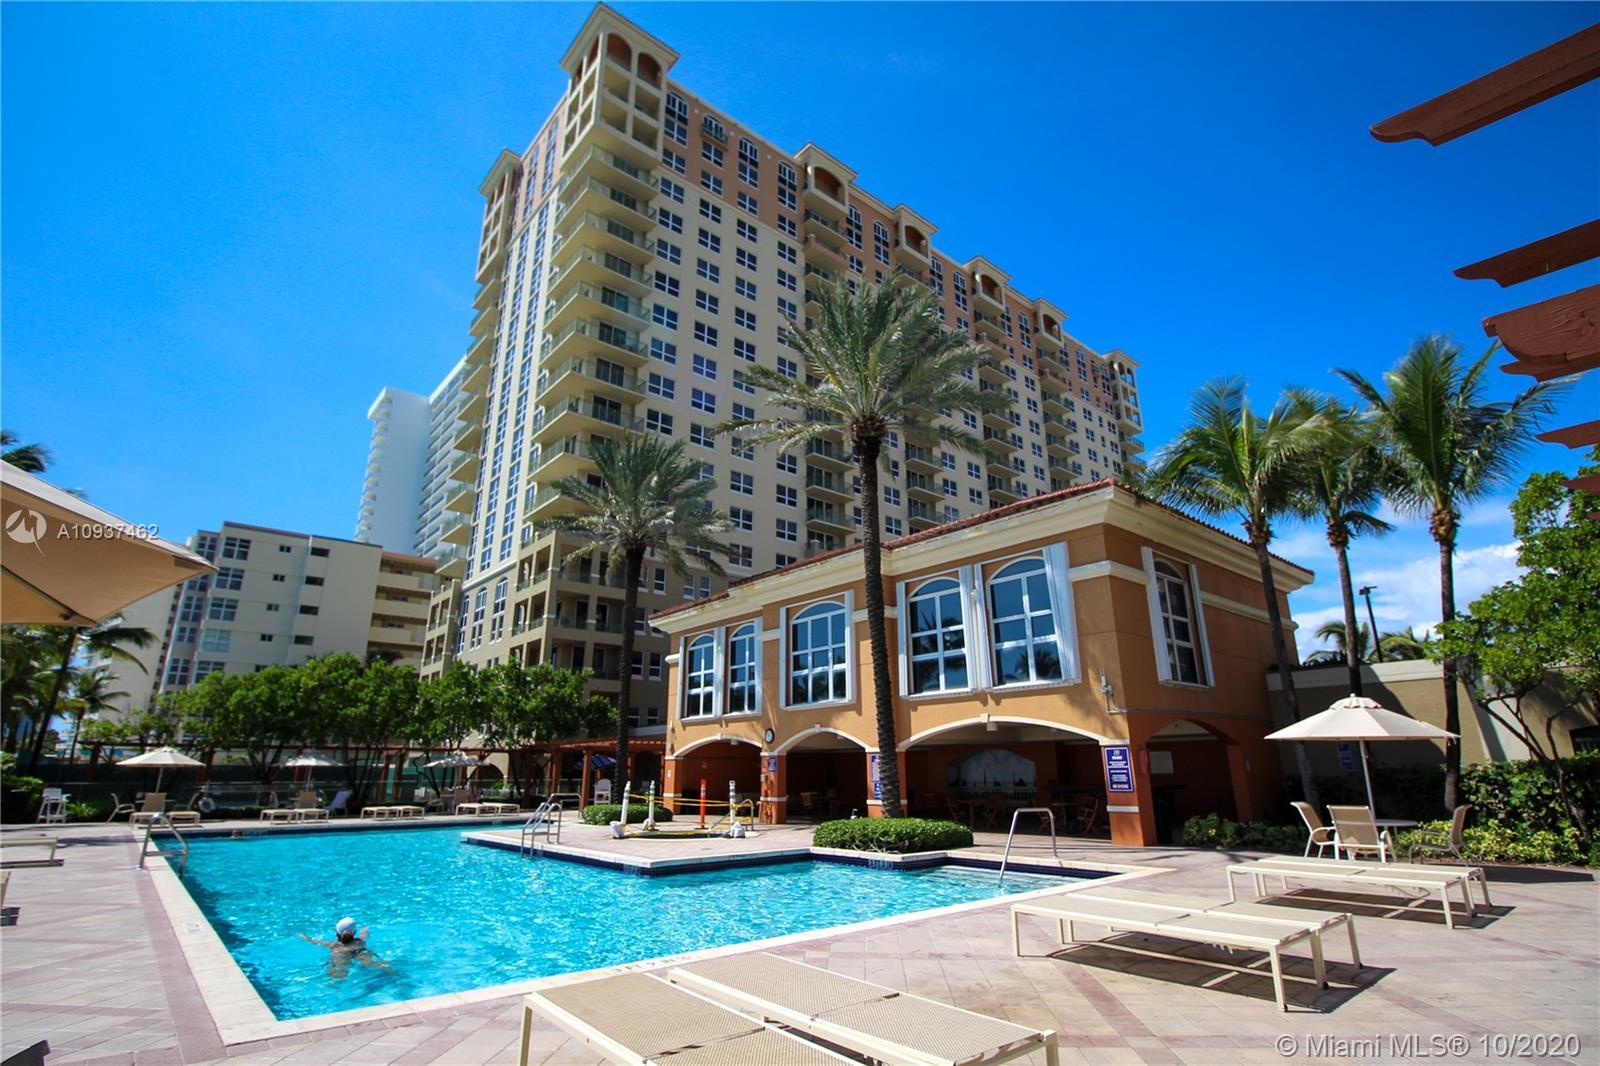 2080 Hallandale #1511 - 2080 S Ocean Dr #1511, Hallandale Beach, FL 33009